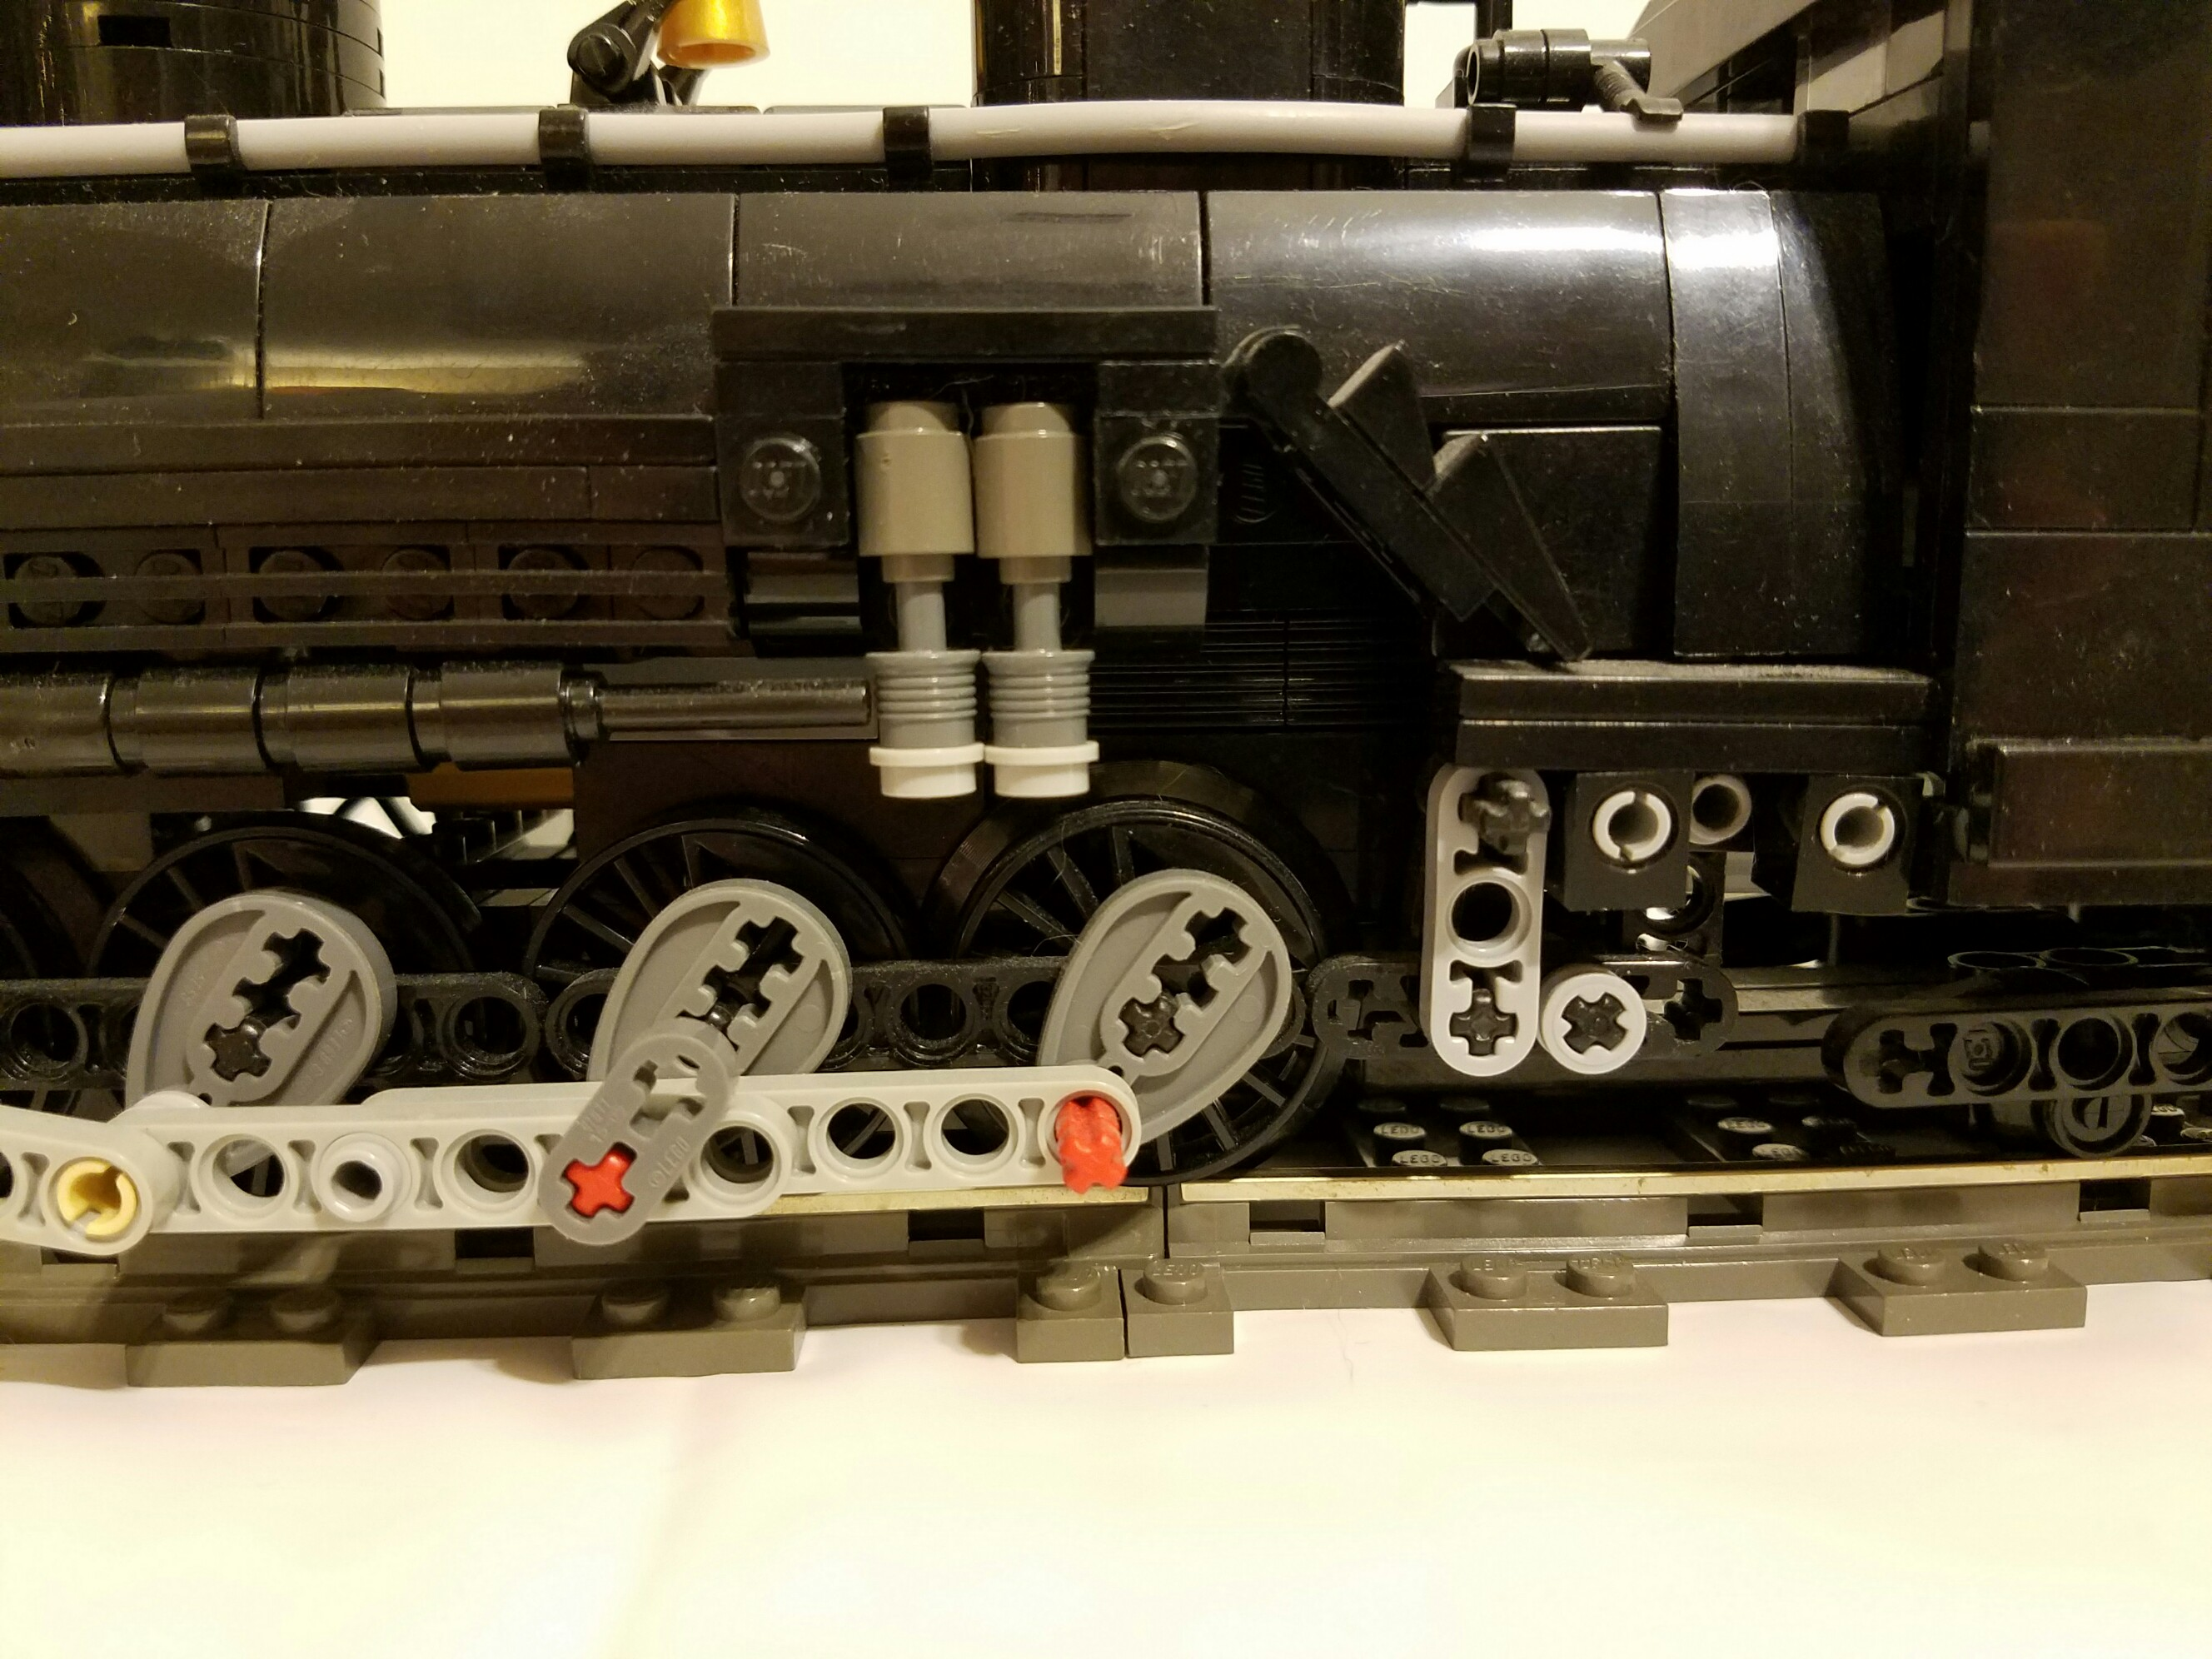 engine_17-2656x1992.jpg